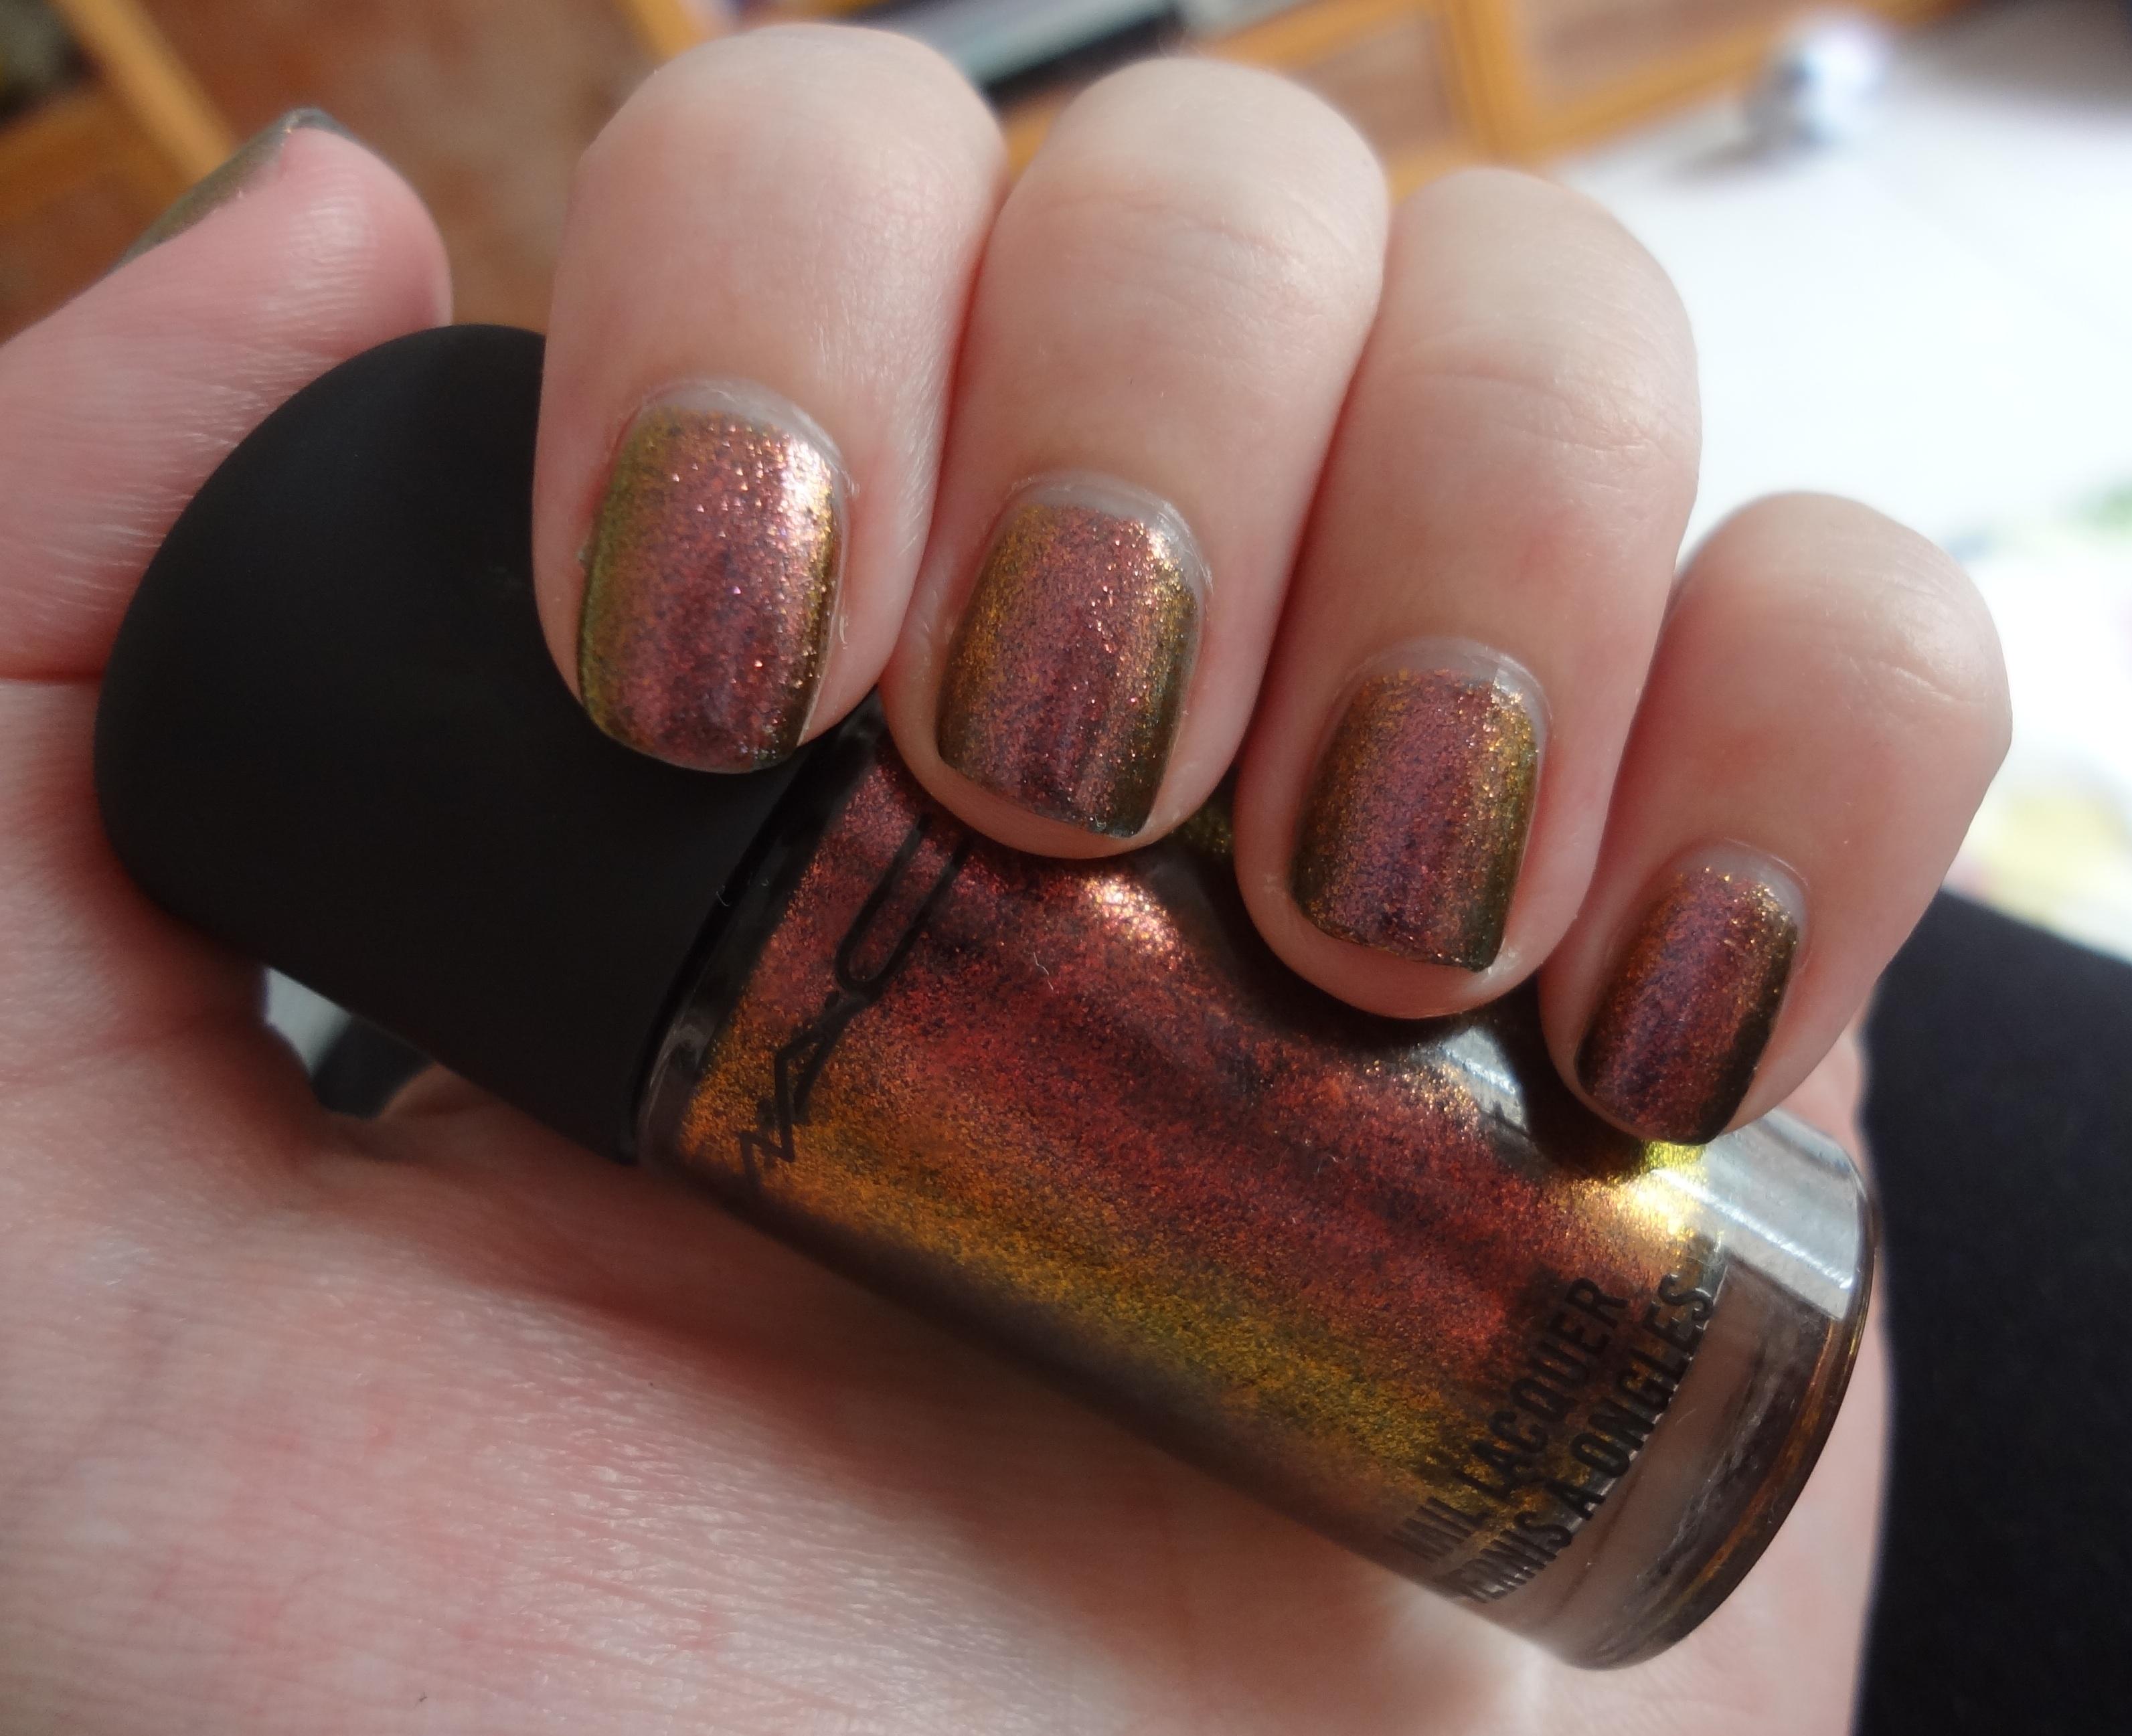 Mac Mean & Green nail polish review | Through The Looking Glass